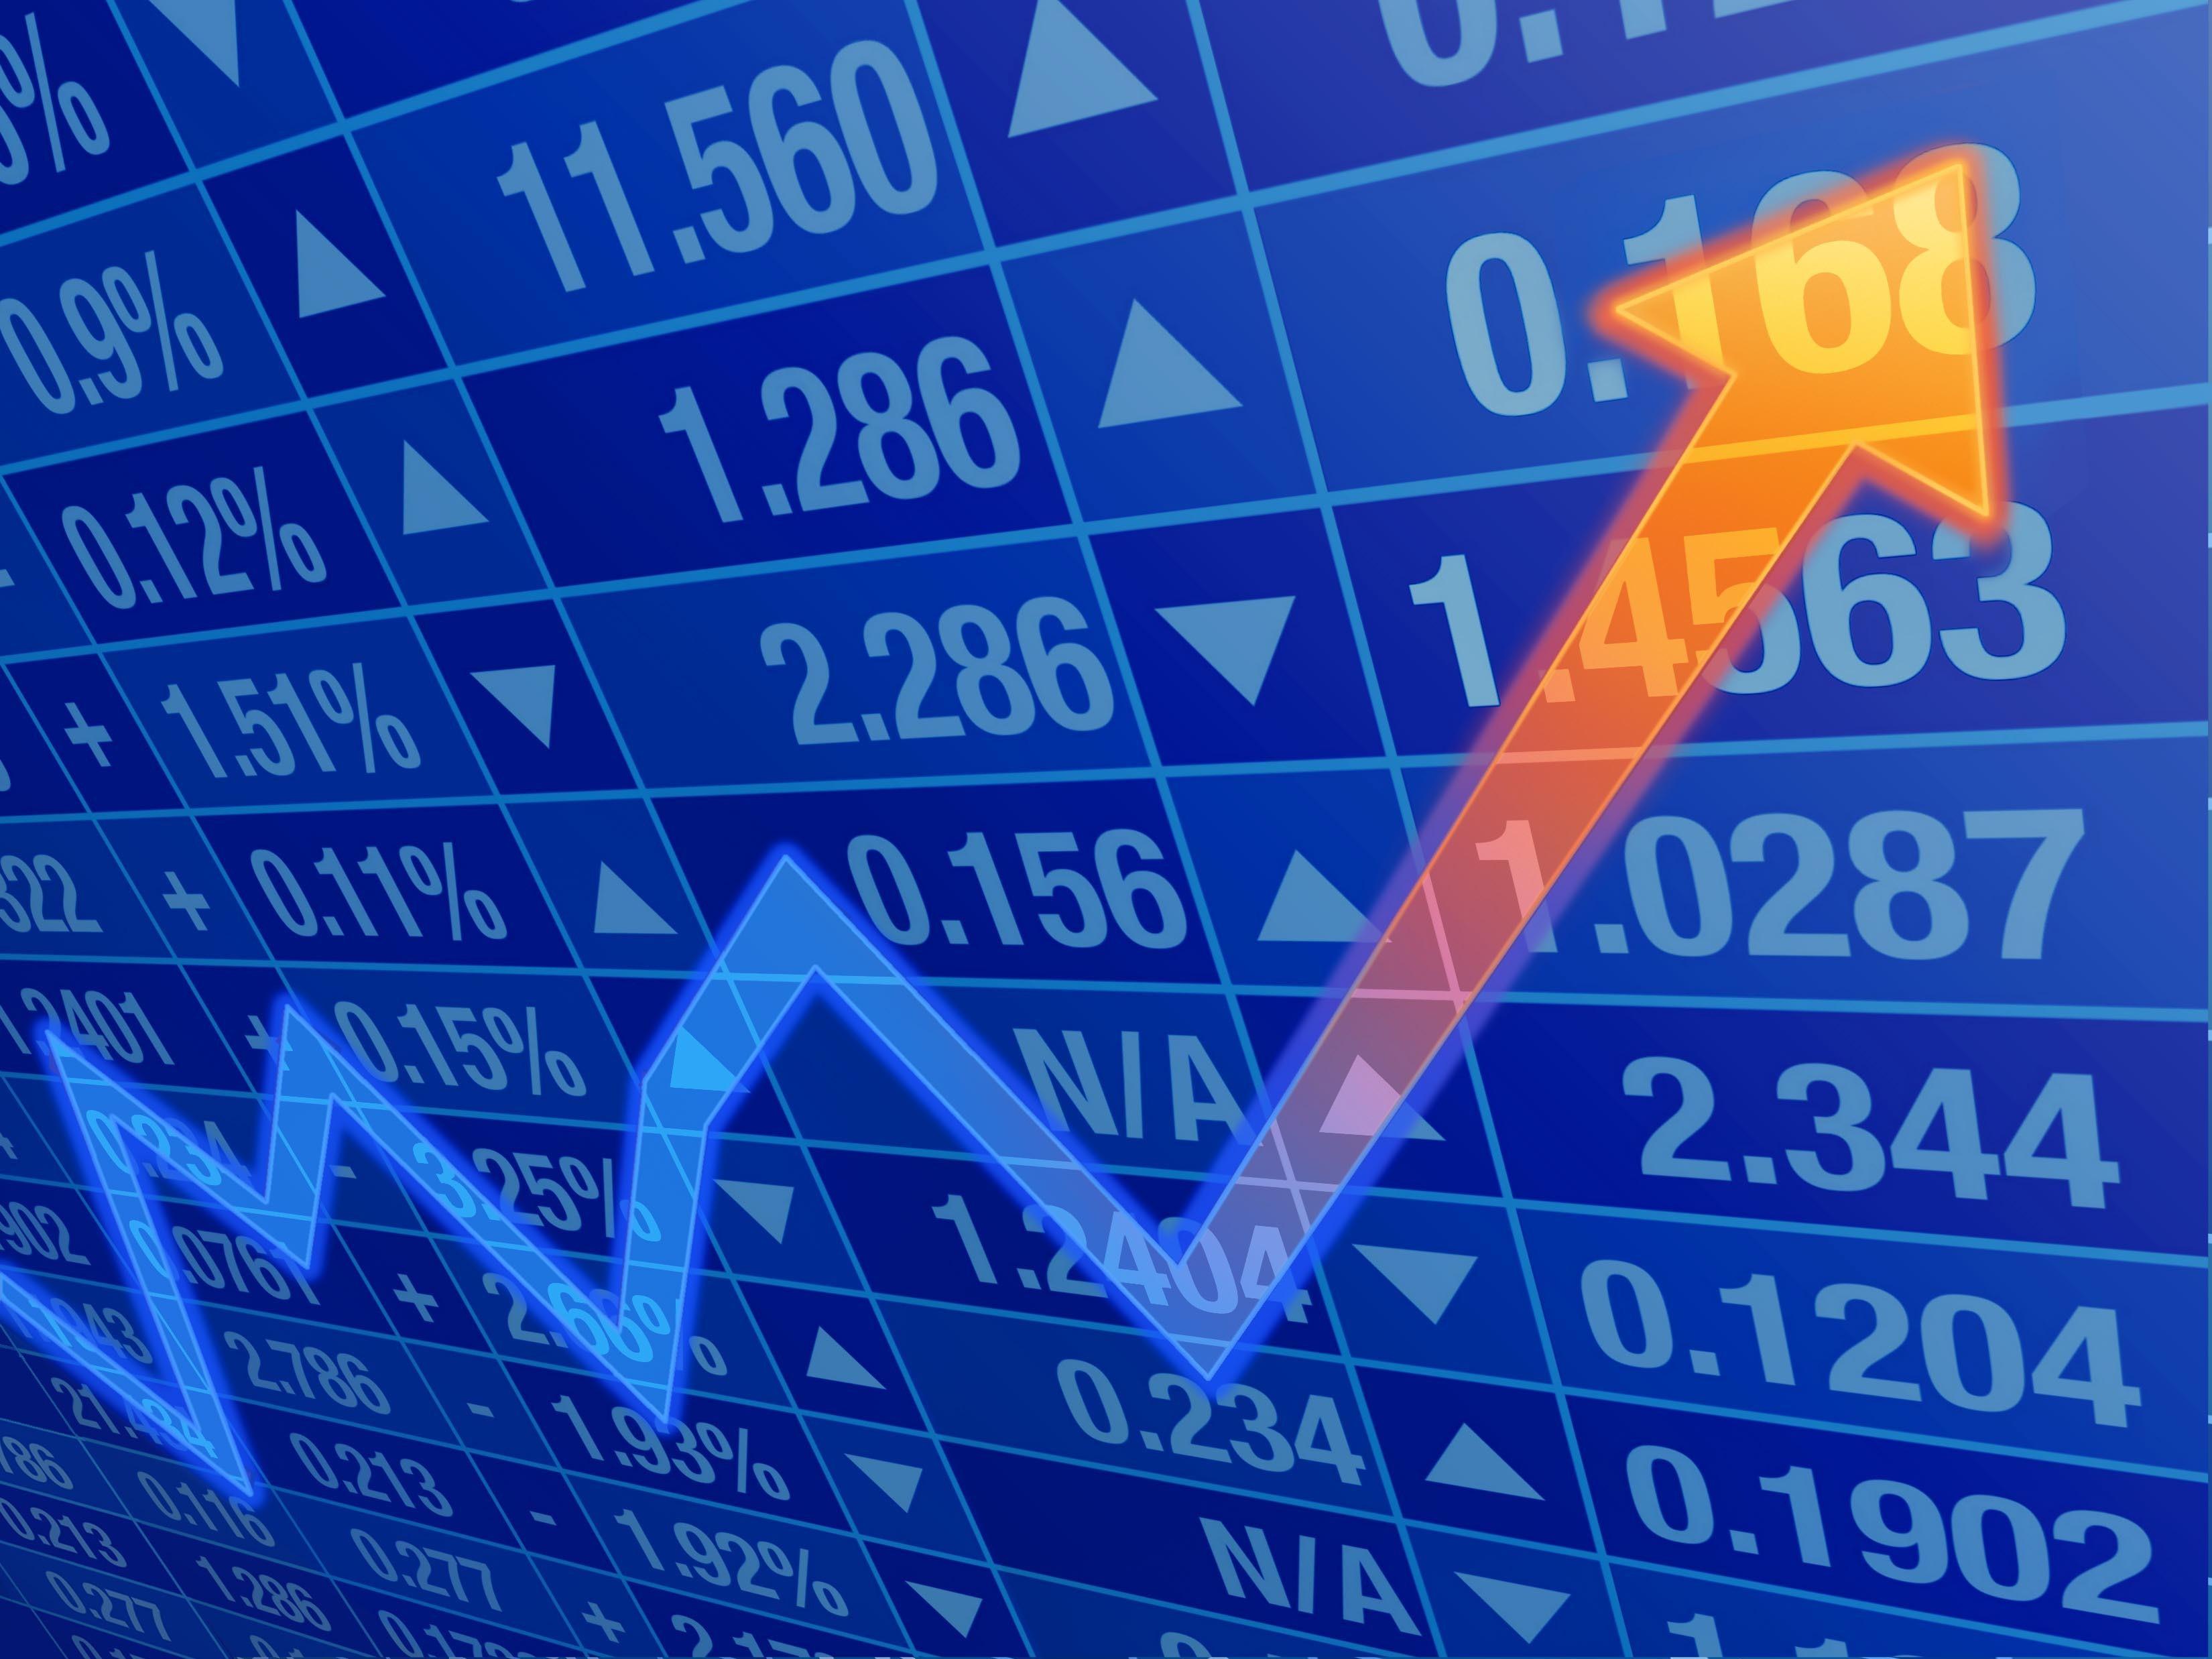 ir sofian akademi jl stock market di bursa saham